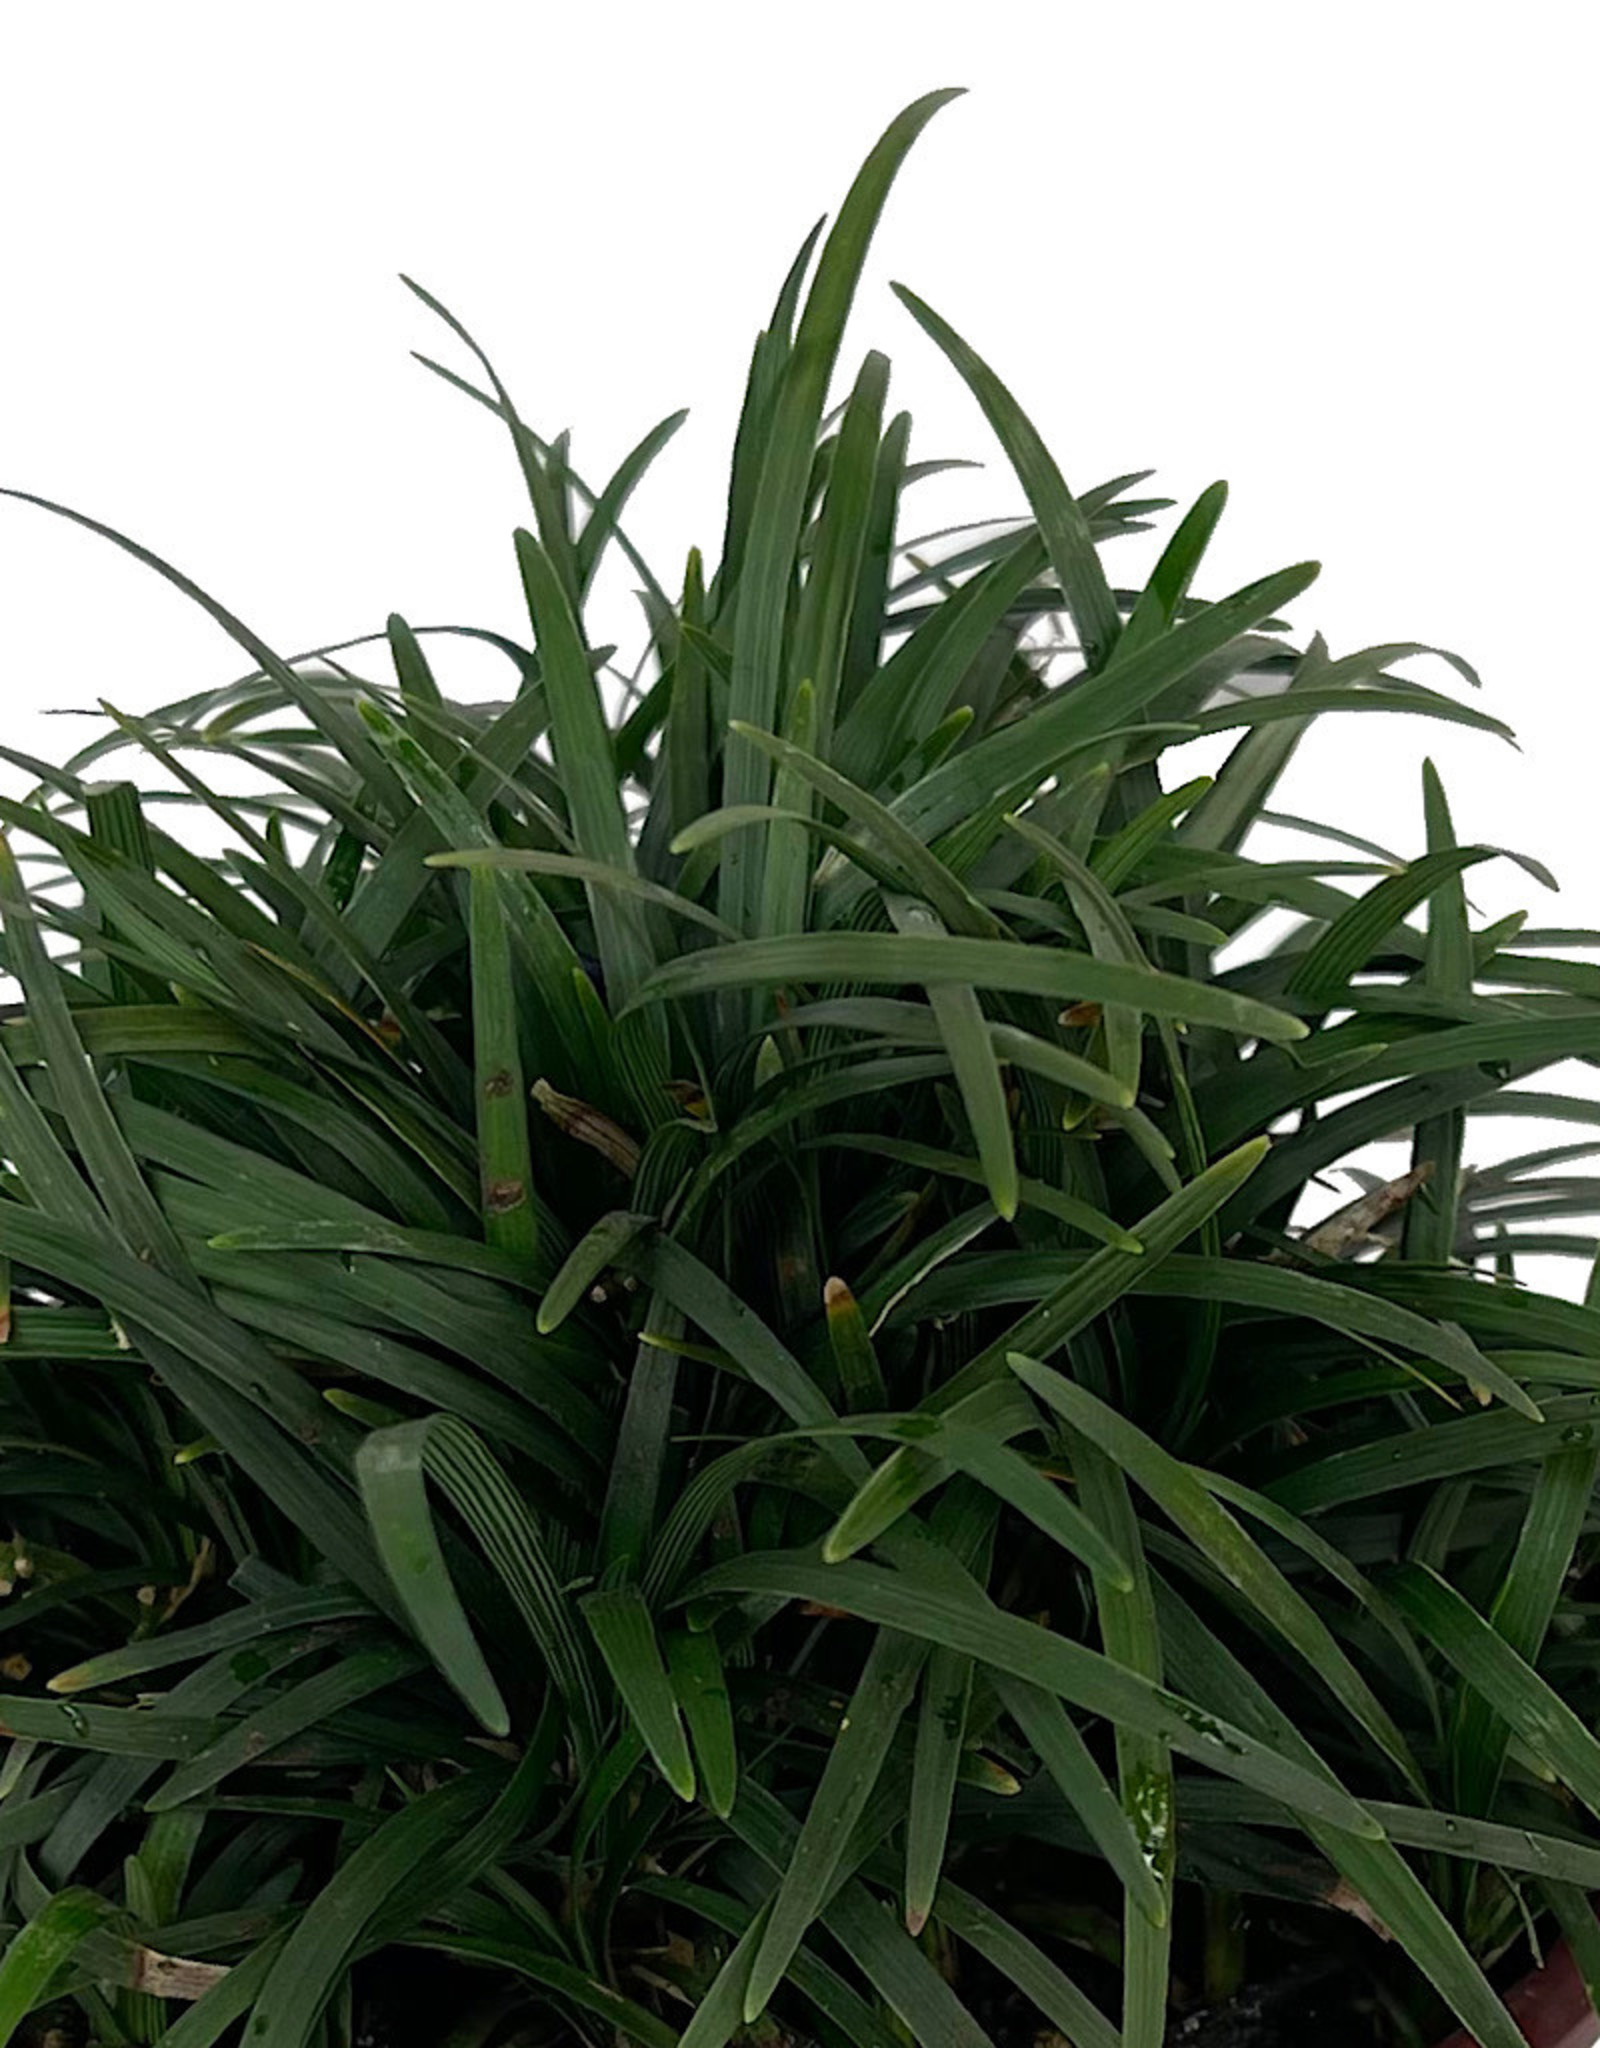 Ophiopogon j. 'Nanus' Quart